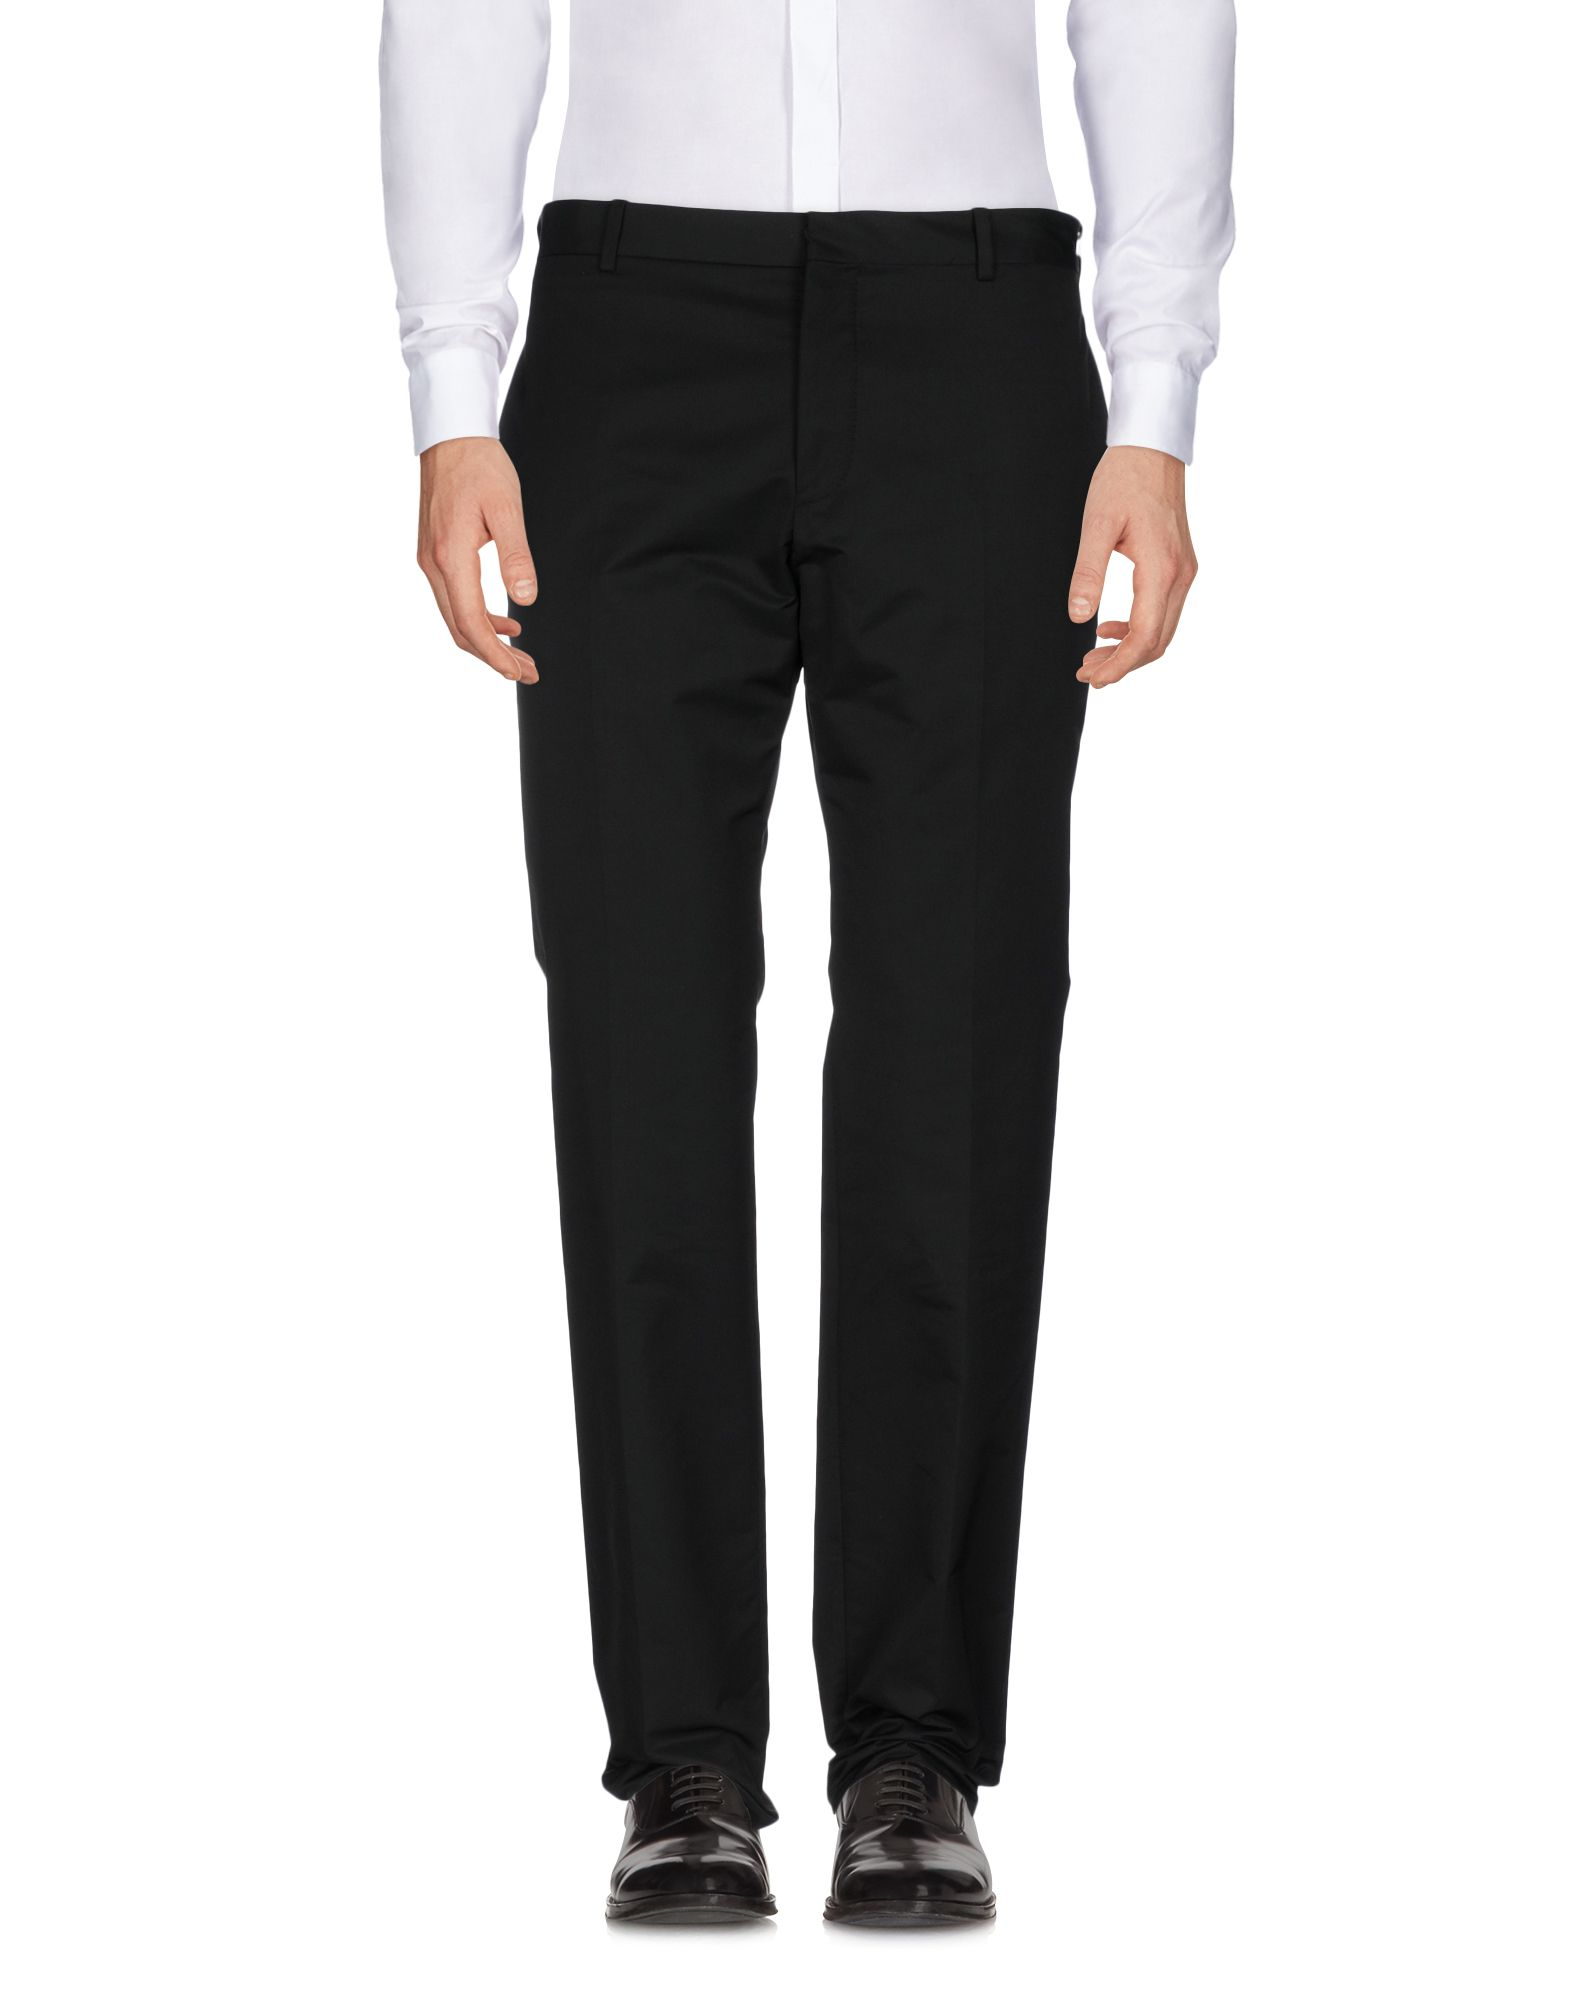 Pantalone Balenciaga Uomo - Acquista online su